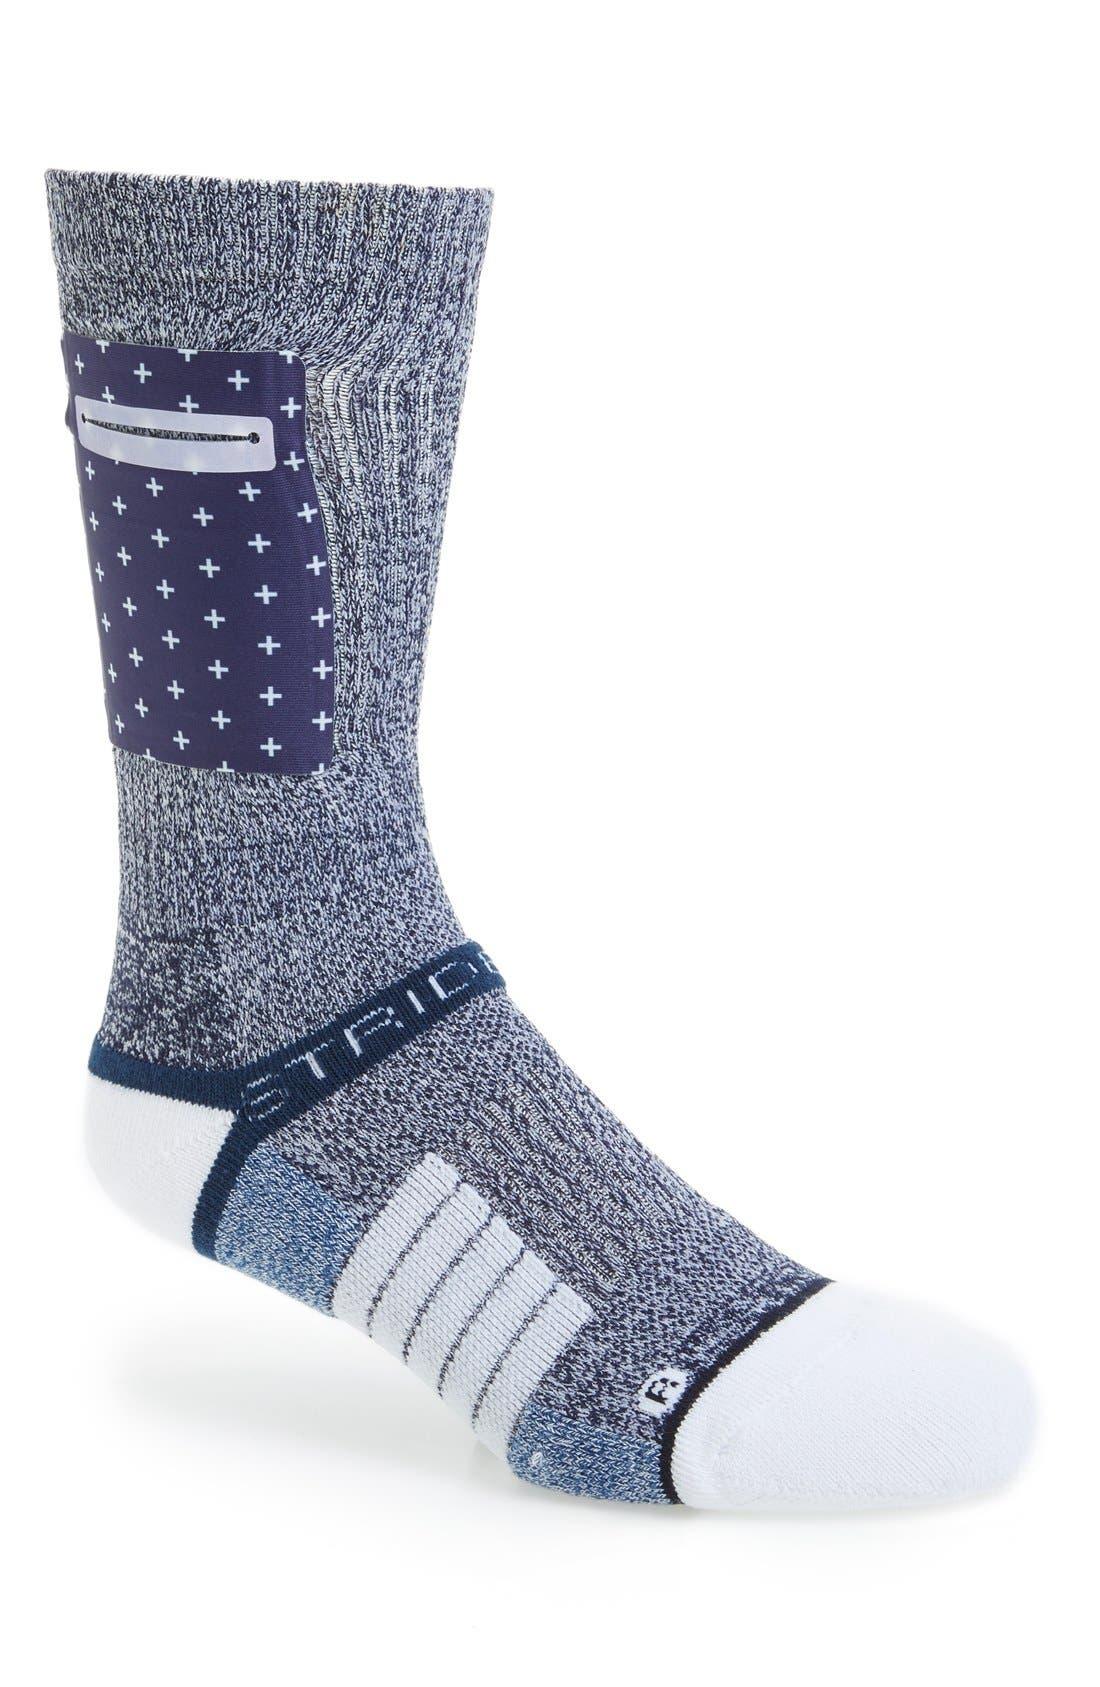 x Nate Robinson 'Pocket Sock - Portside' Strapped Fit 2.0 Socks, Main, color, 020